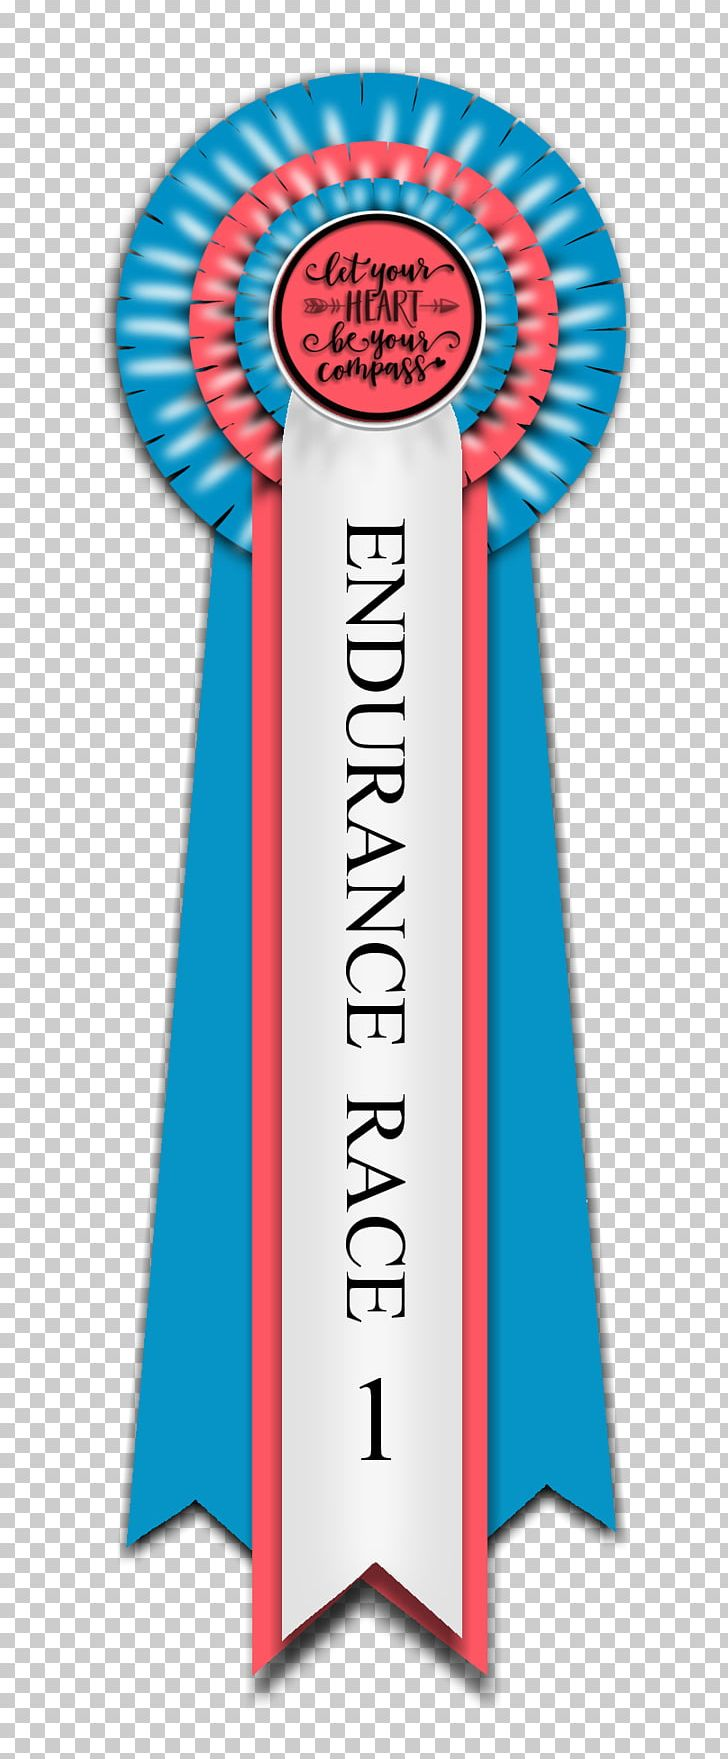 Basic Training Honor Graduate Ribbon Medal Dog Prize PNG, Clipart.